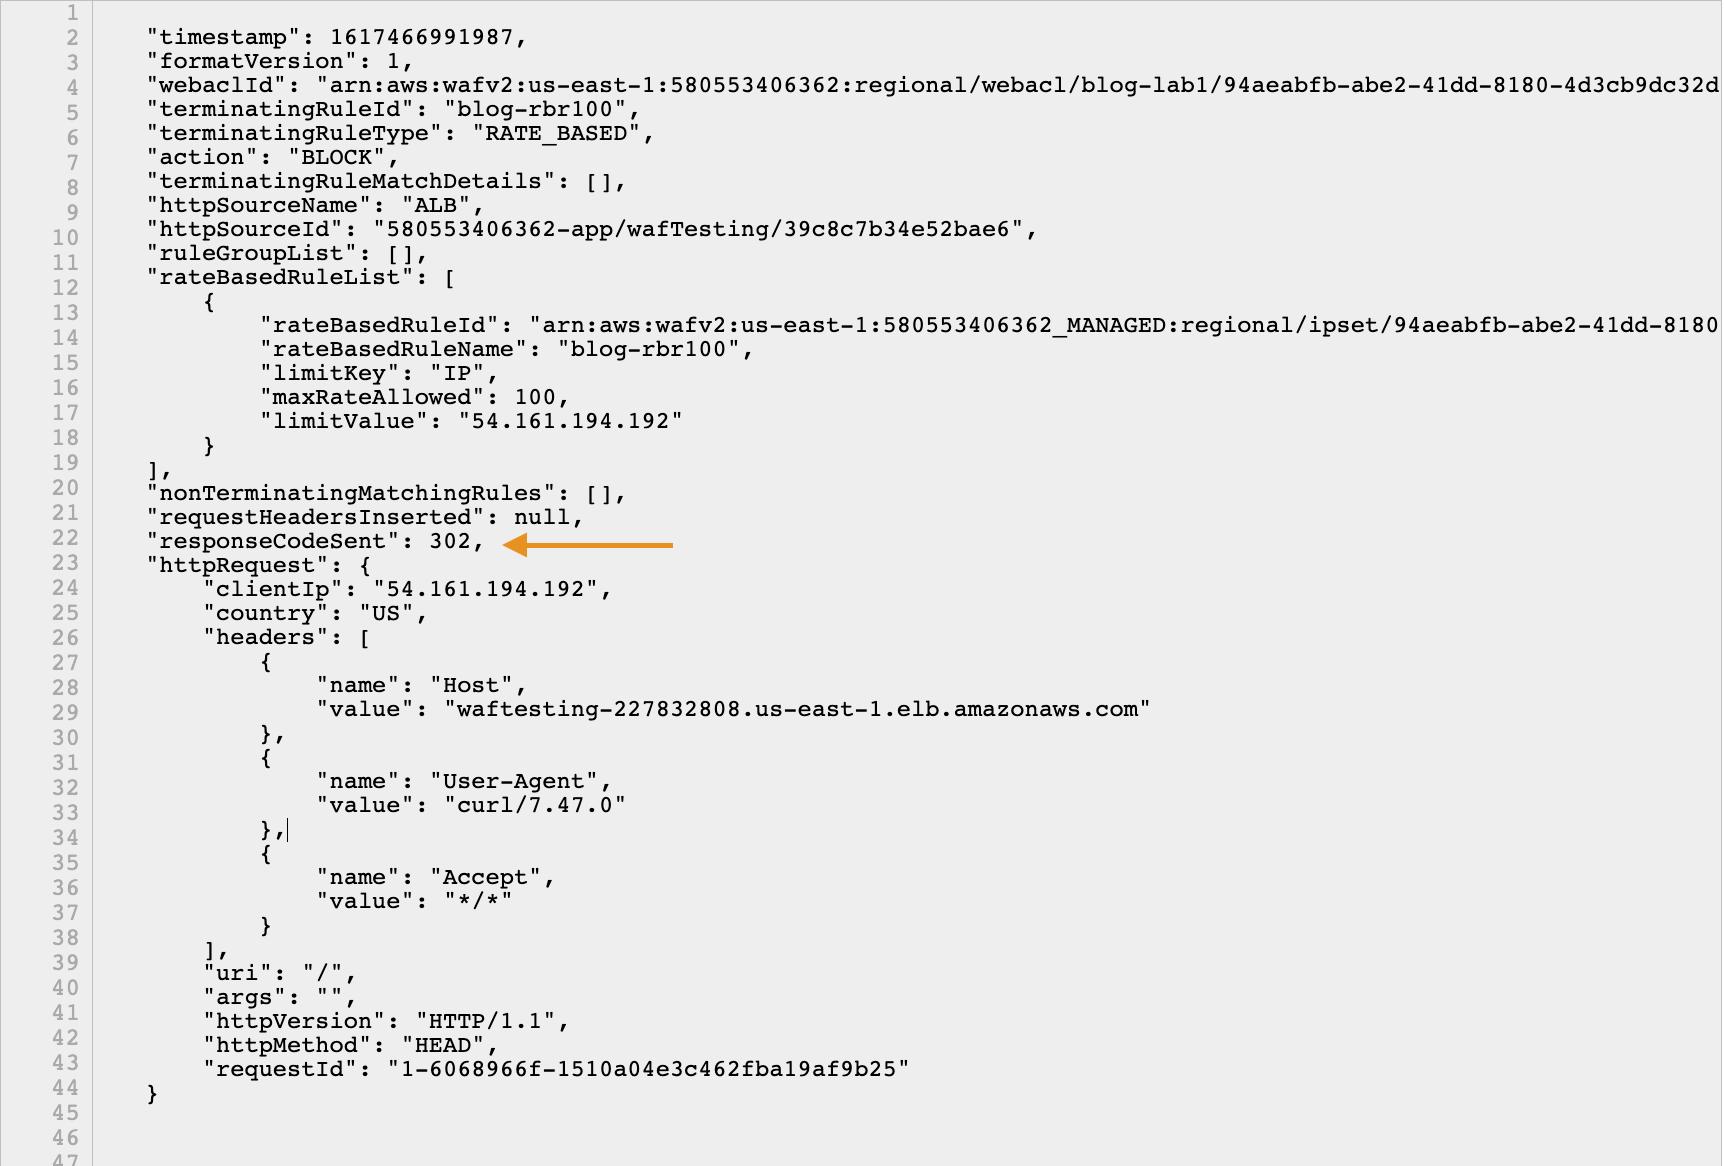 Figure 3: Verifying the AWS WAF logs for custom response